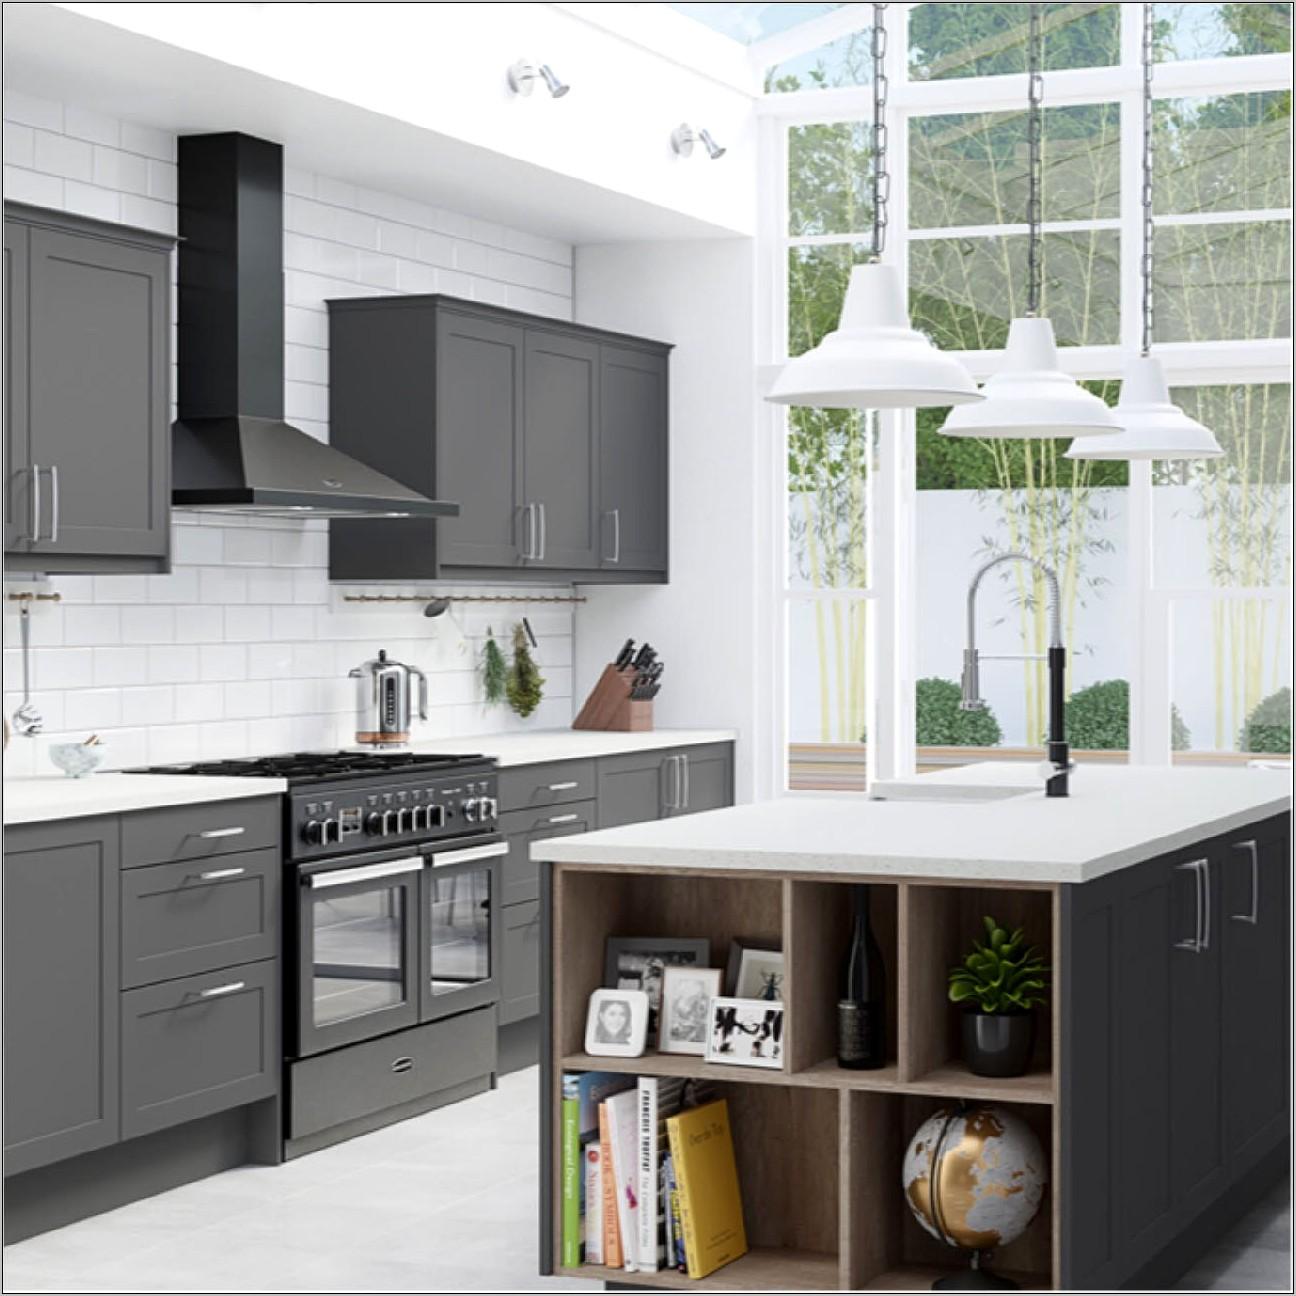 Kitchen Tea Decorations Diy